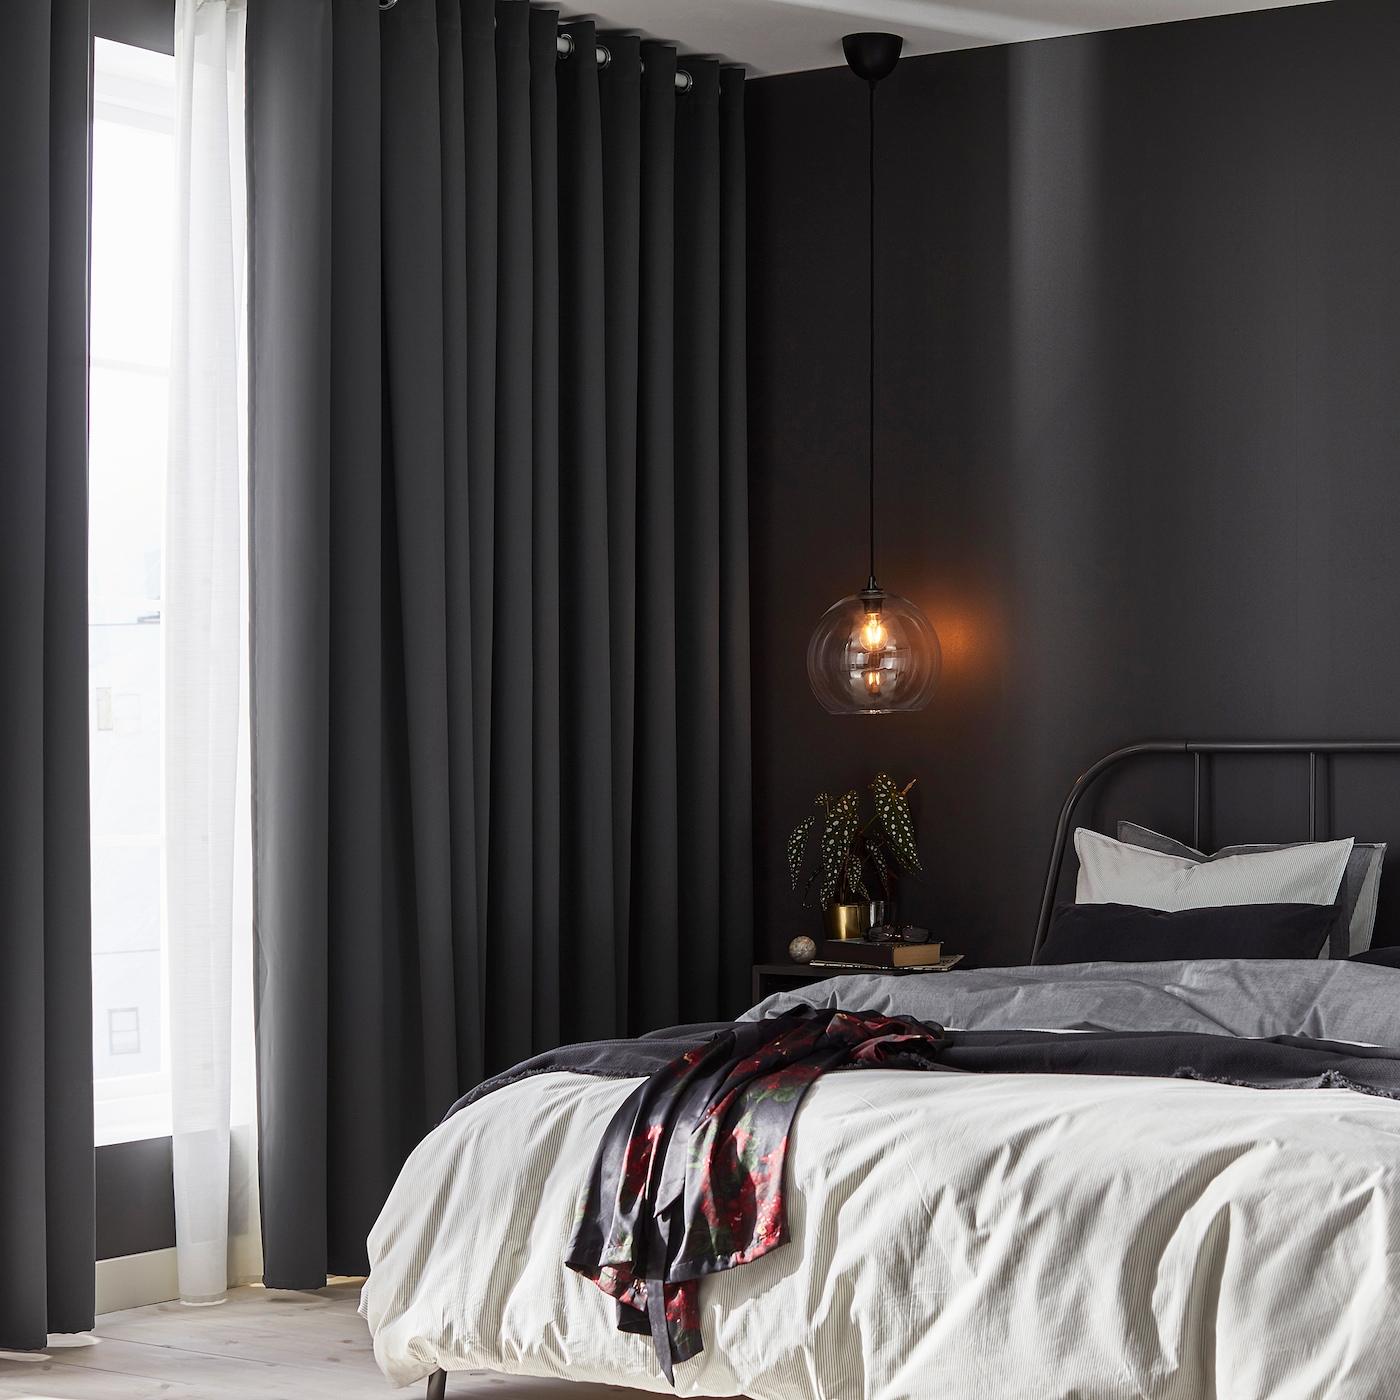 HILLEBORG Block-out curtains, 5 pair - grey 545x5 cm